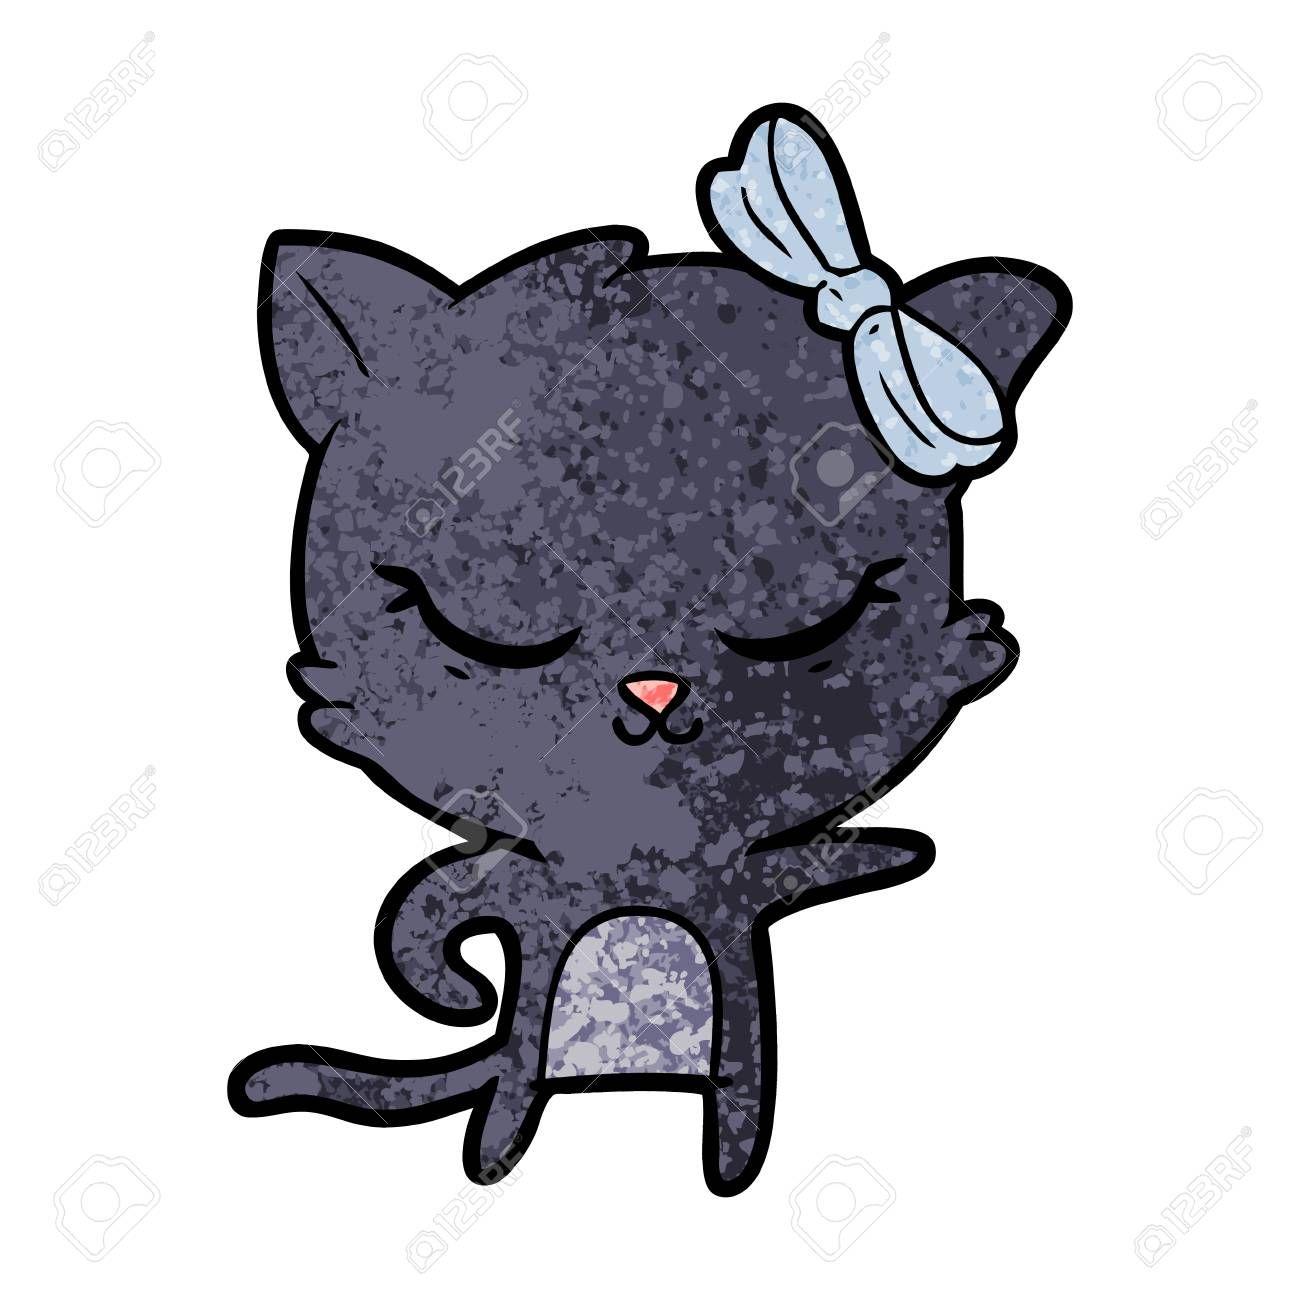 Cute Cartoon Cat With Bow Aff Cartoon Cute Bow Cat Cartoon Cat Cute Cartoon Card Design